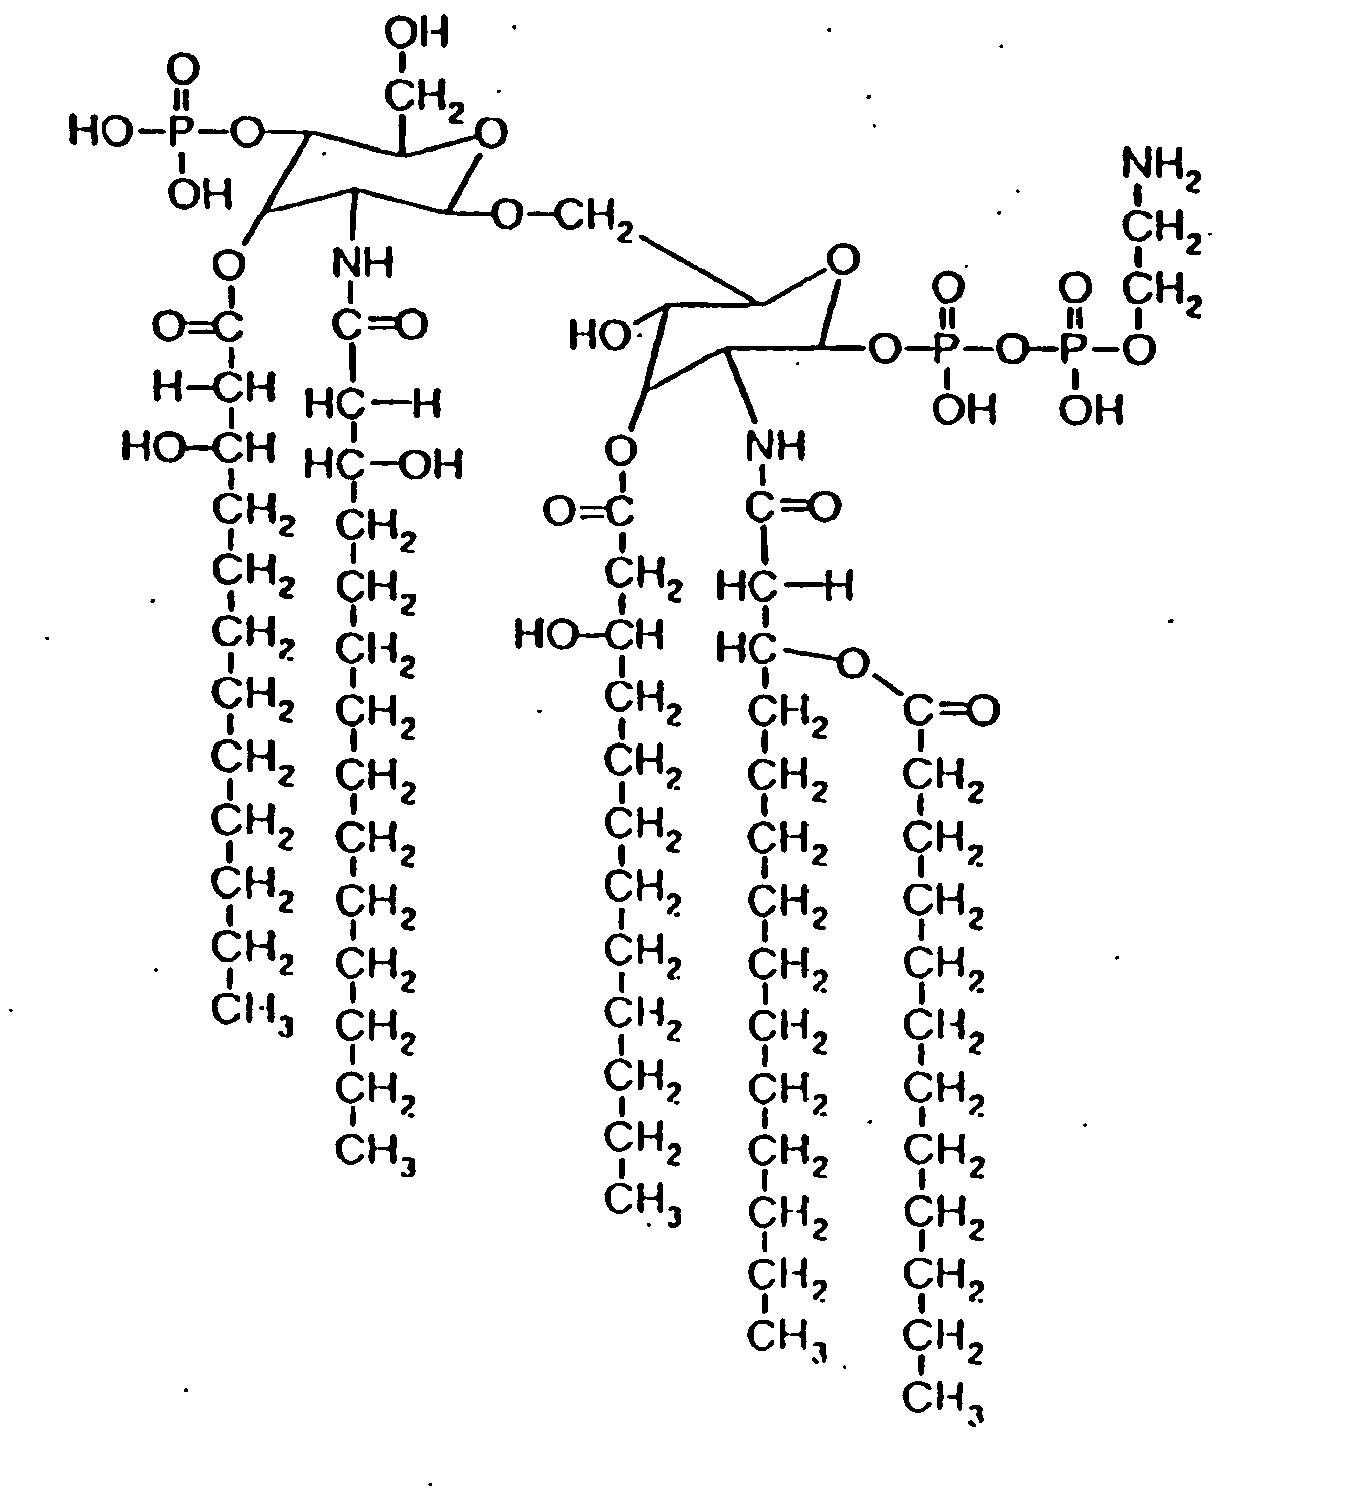 Lipid Molecule Structure